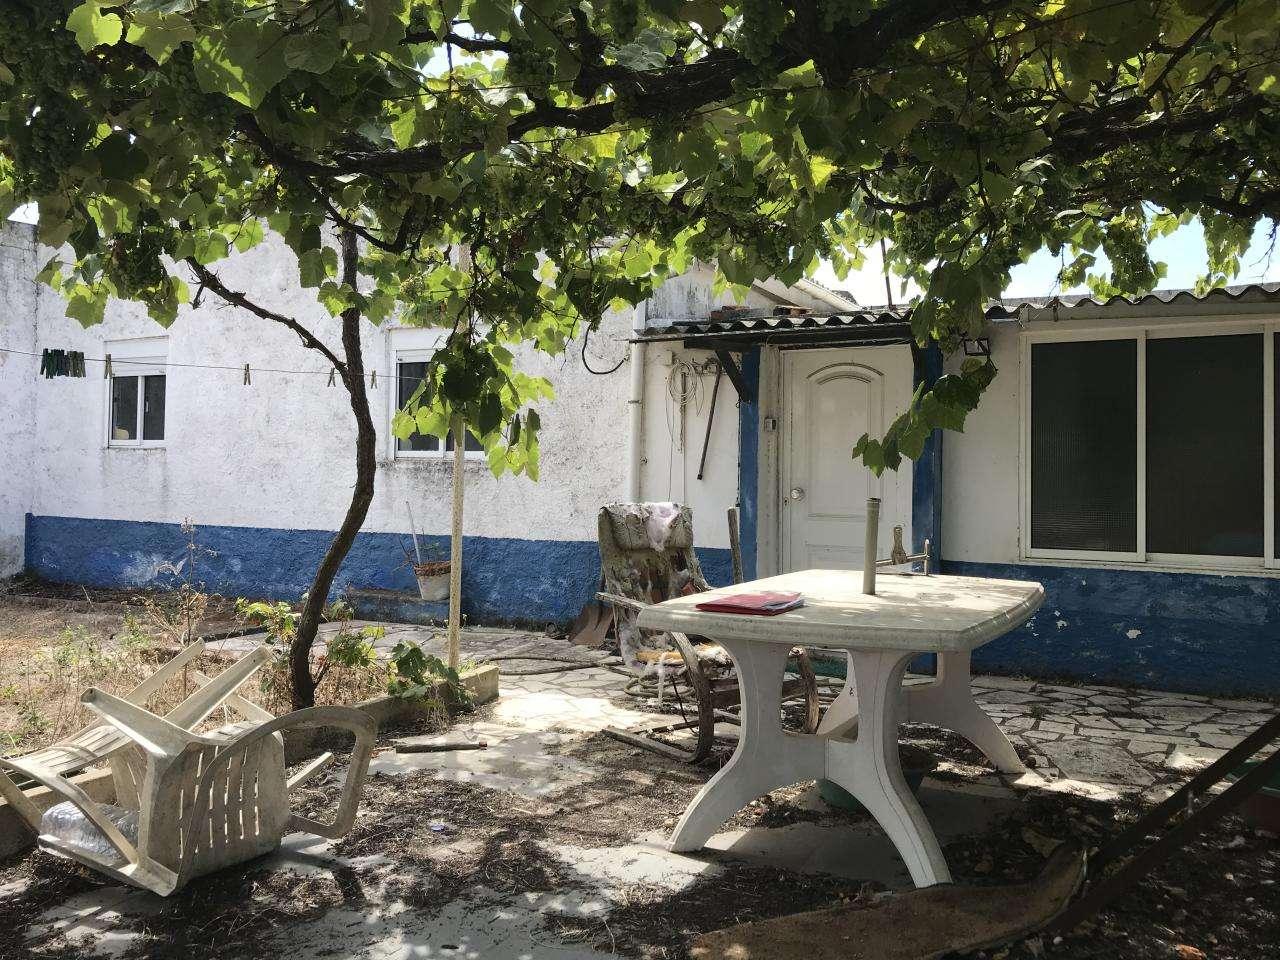 Terreno para comprar, Quinta do Anjo, Setúbal - Foto 17